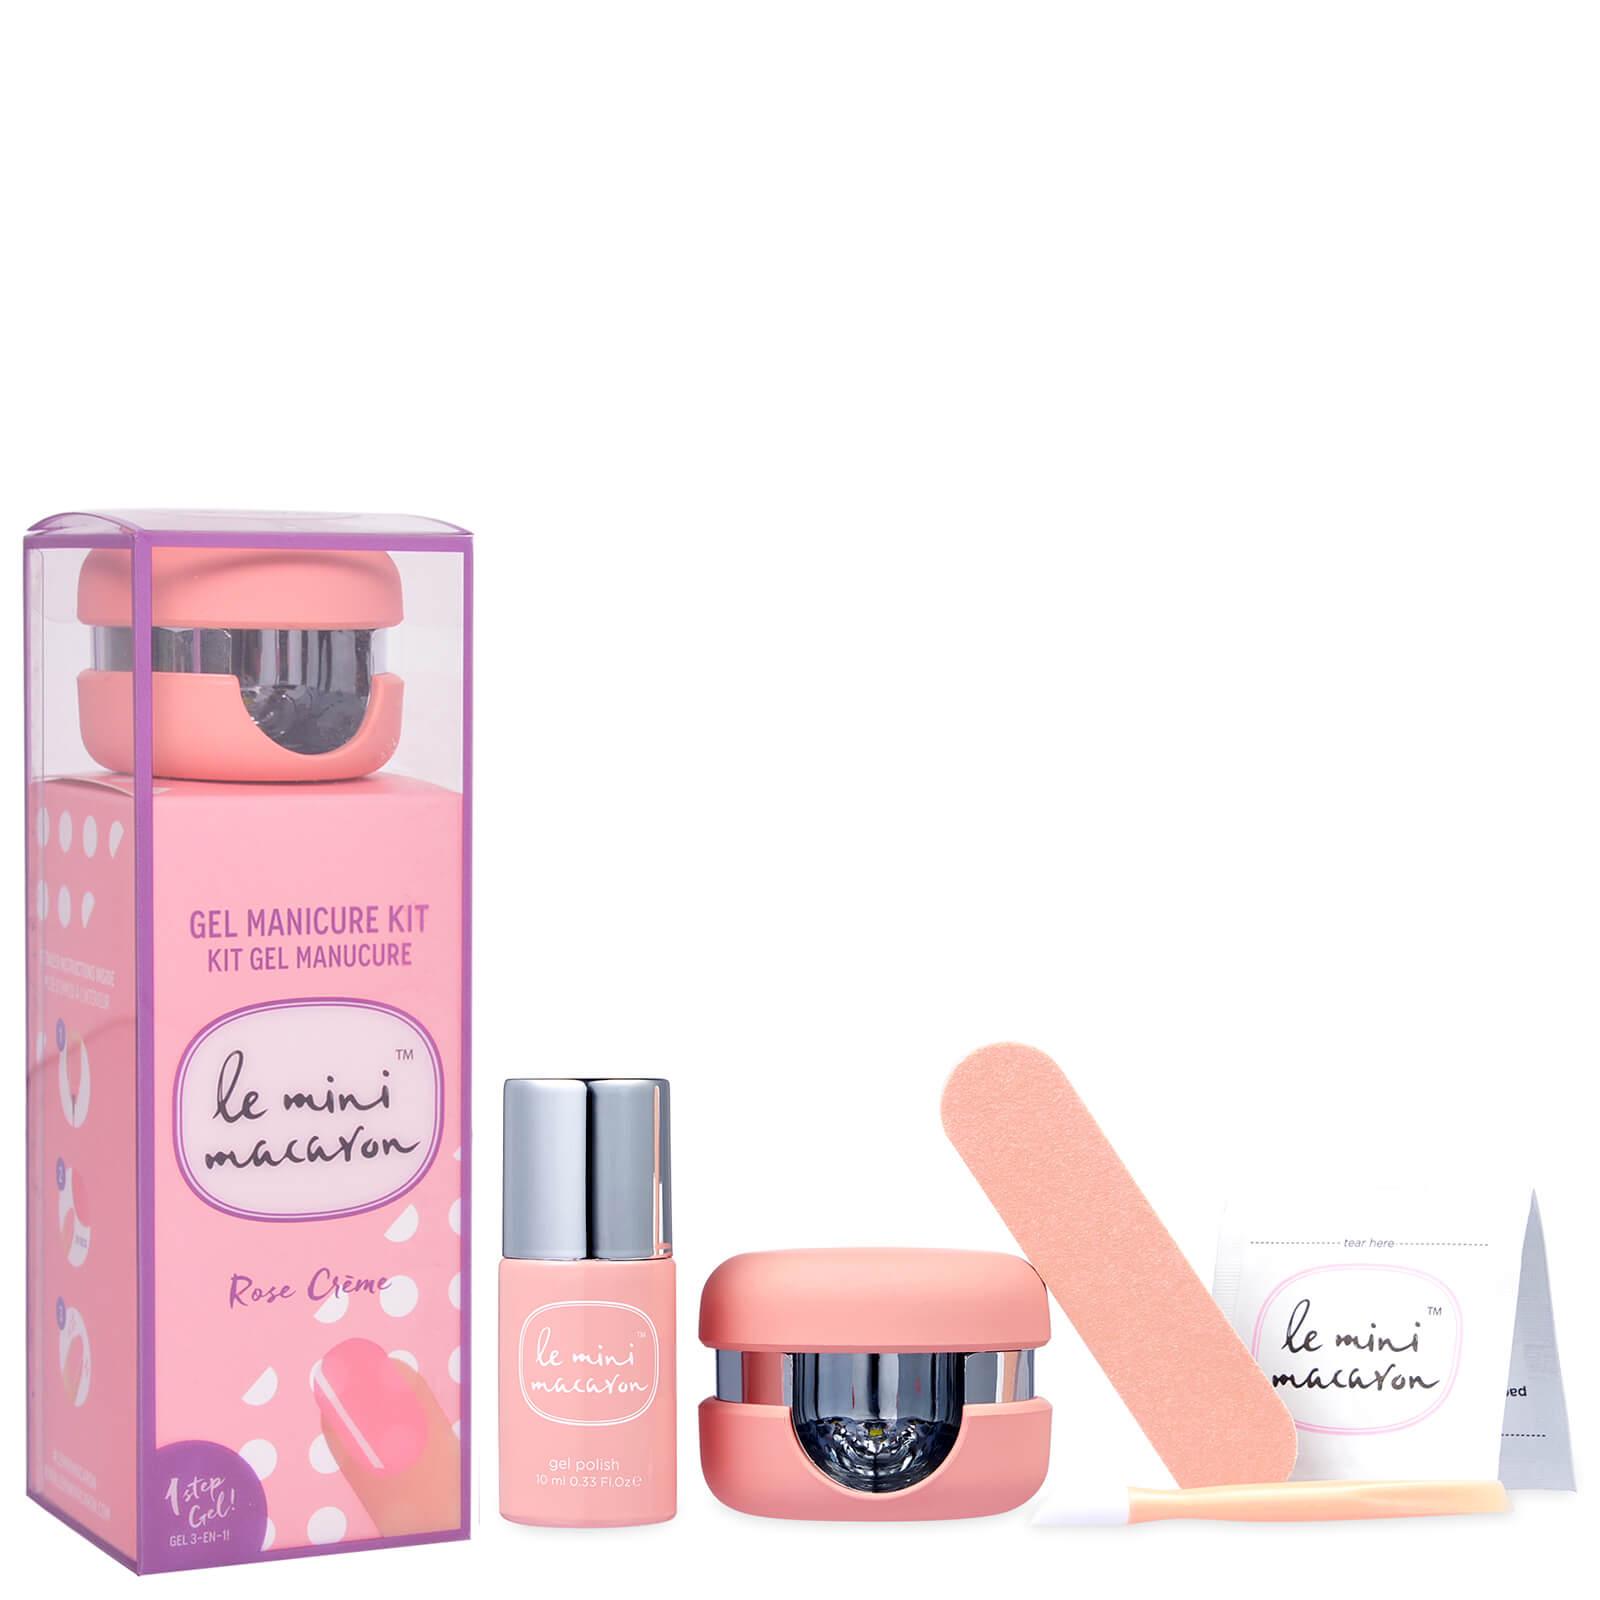 Kit de manicura en gel de Le Mini Macaron - Rose Crème